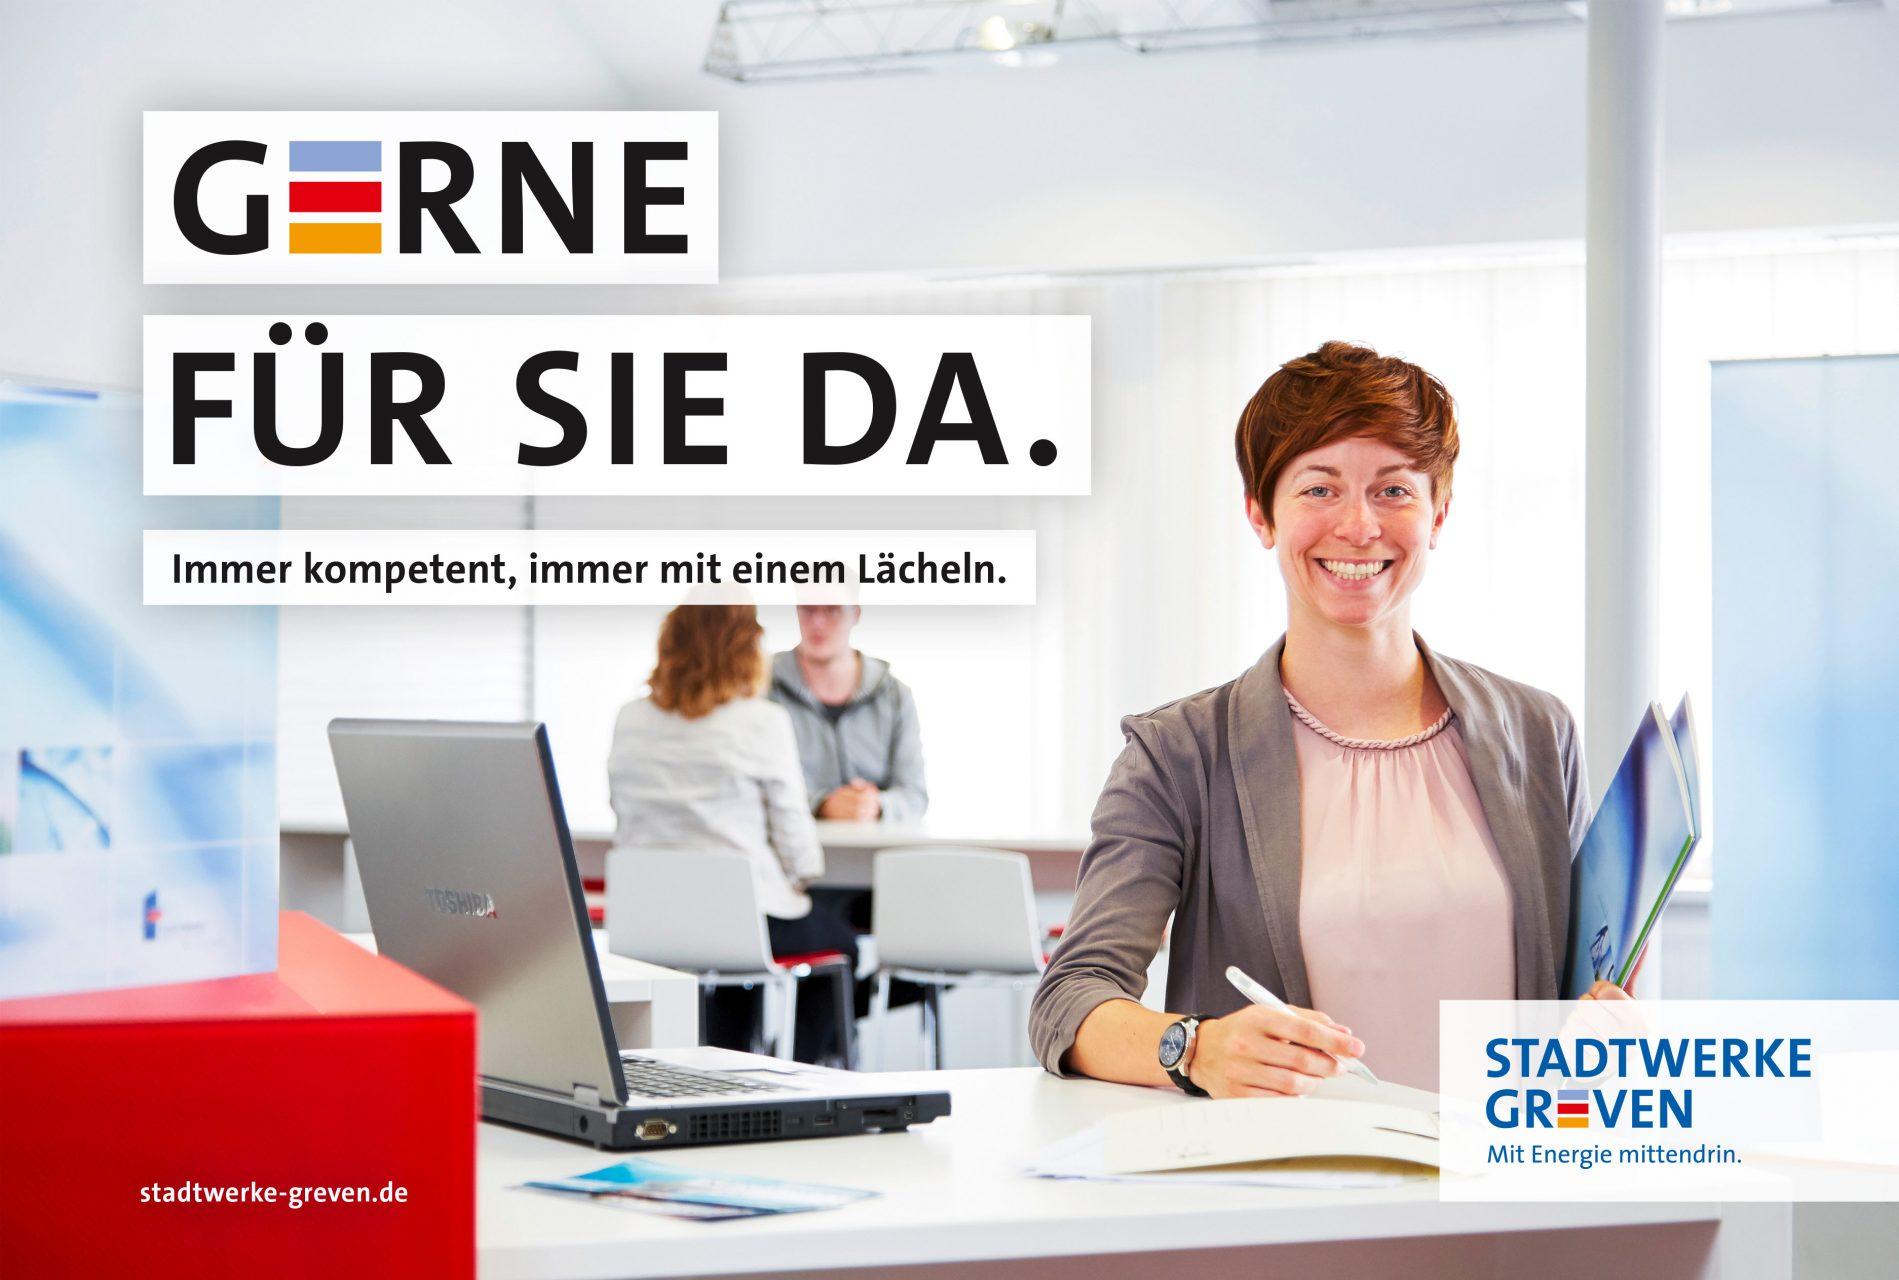 Stadtwerke_Greven_04